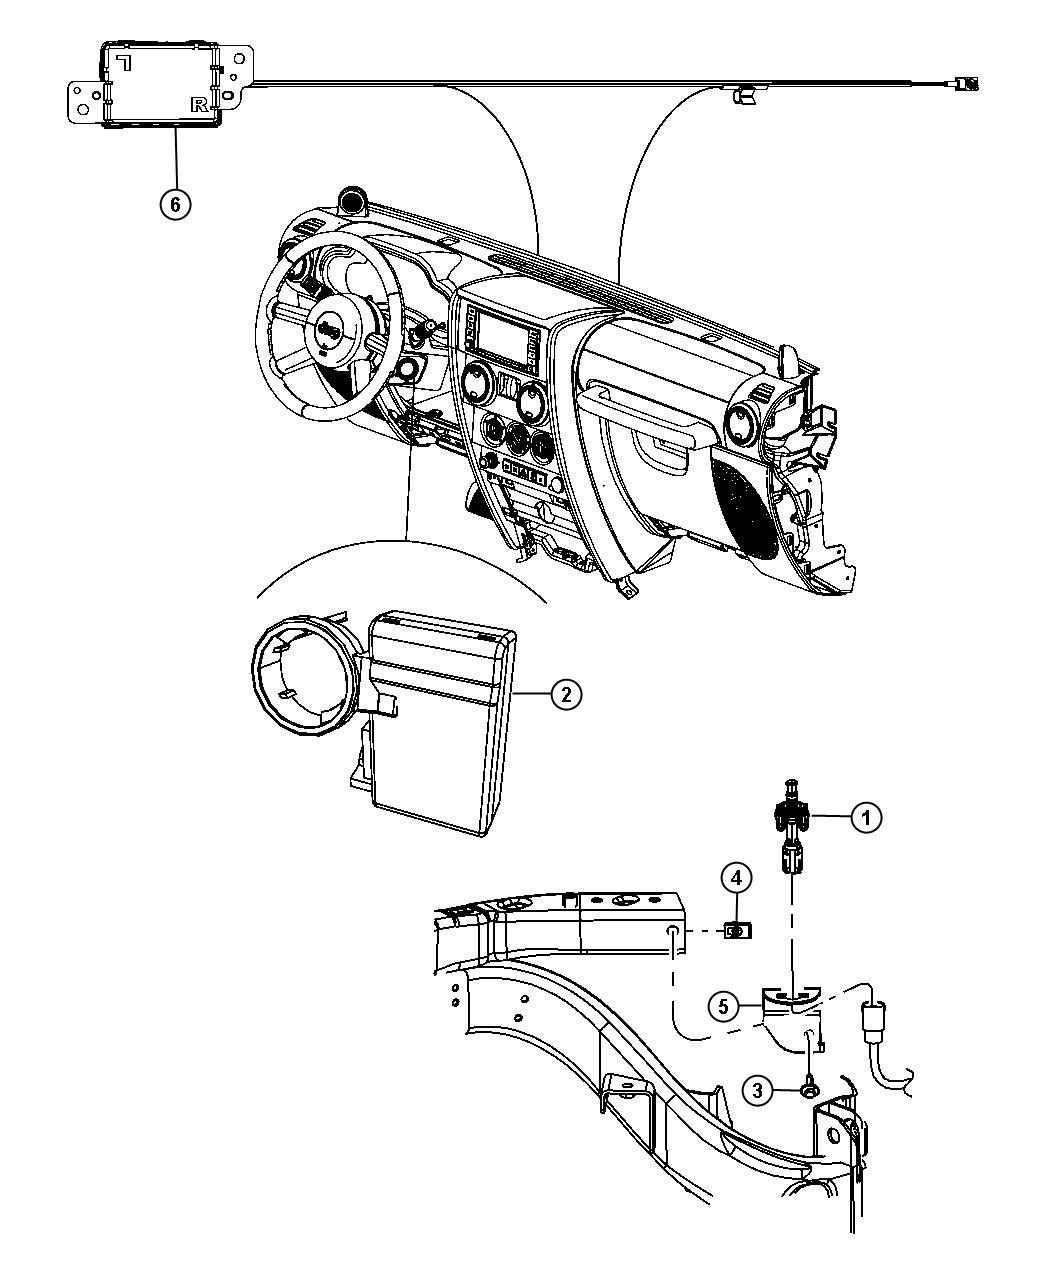 Jeep Wrangler Antenna Remote Start And Keyless Entry